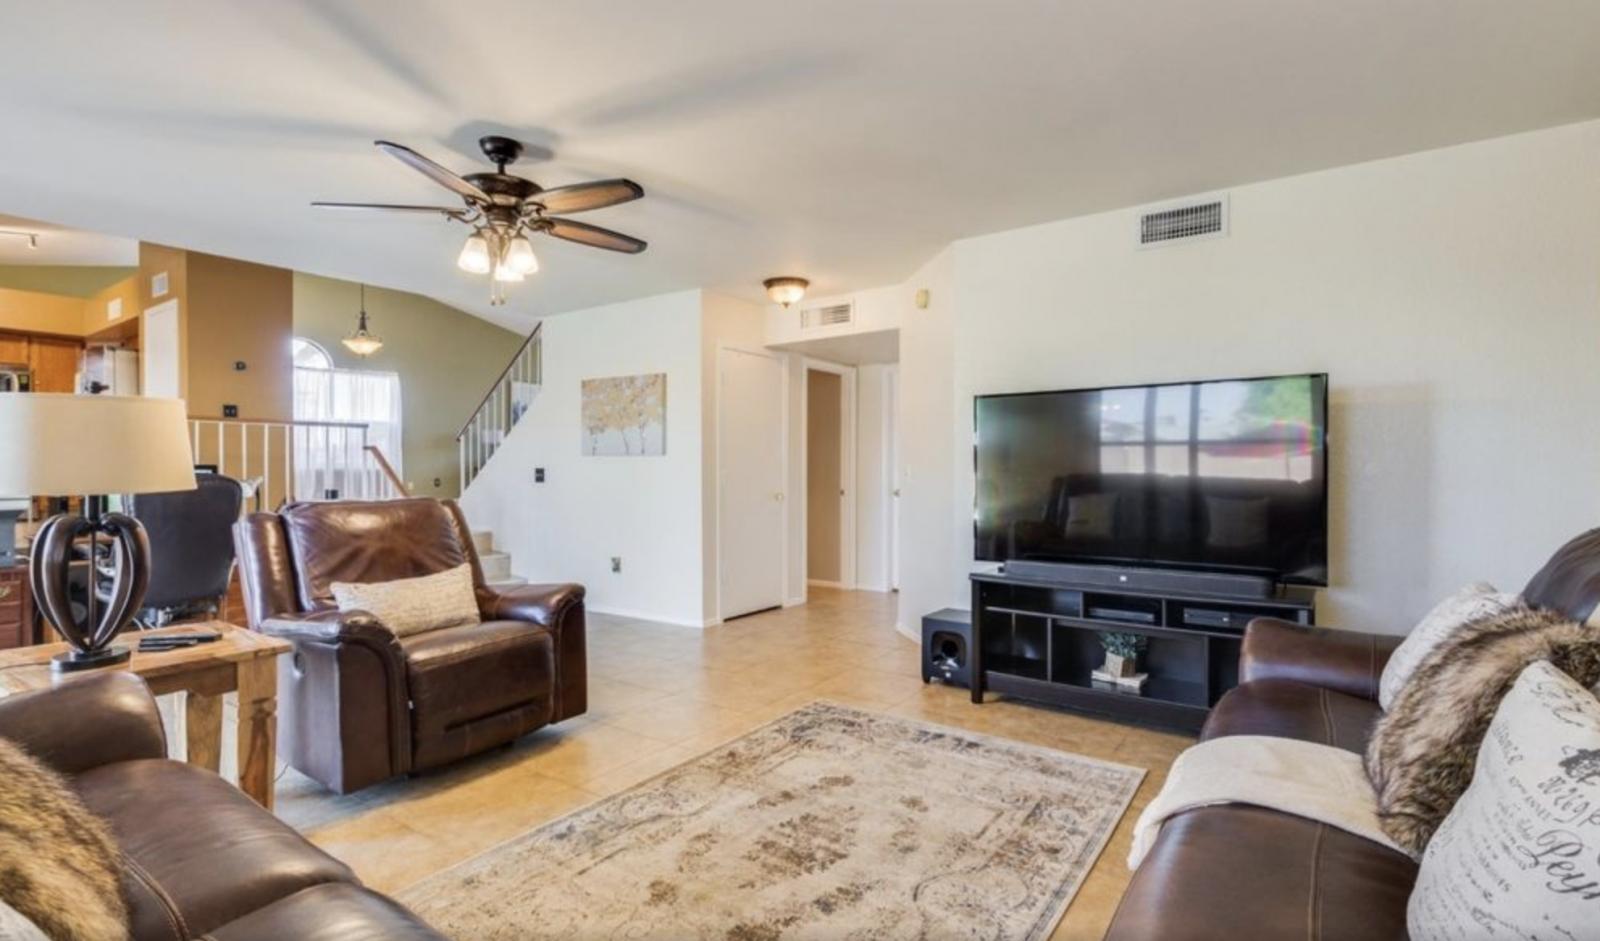 Home for Sale Glendale Arizona